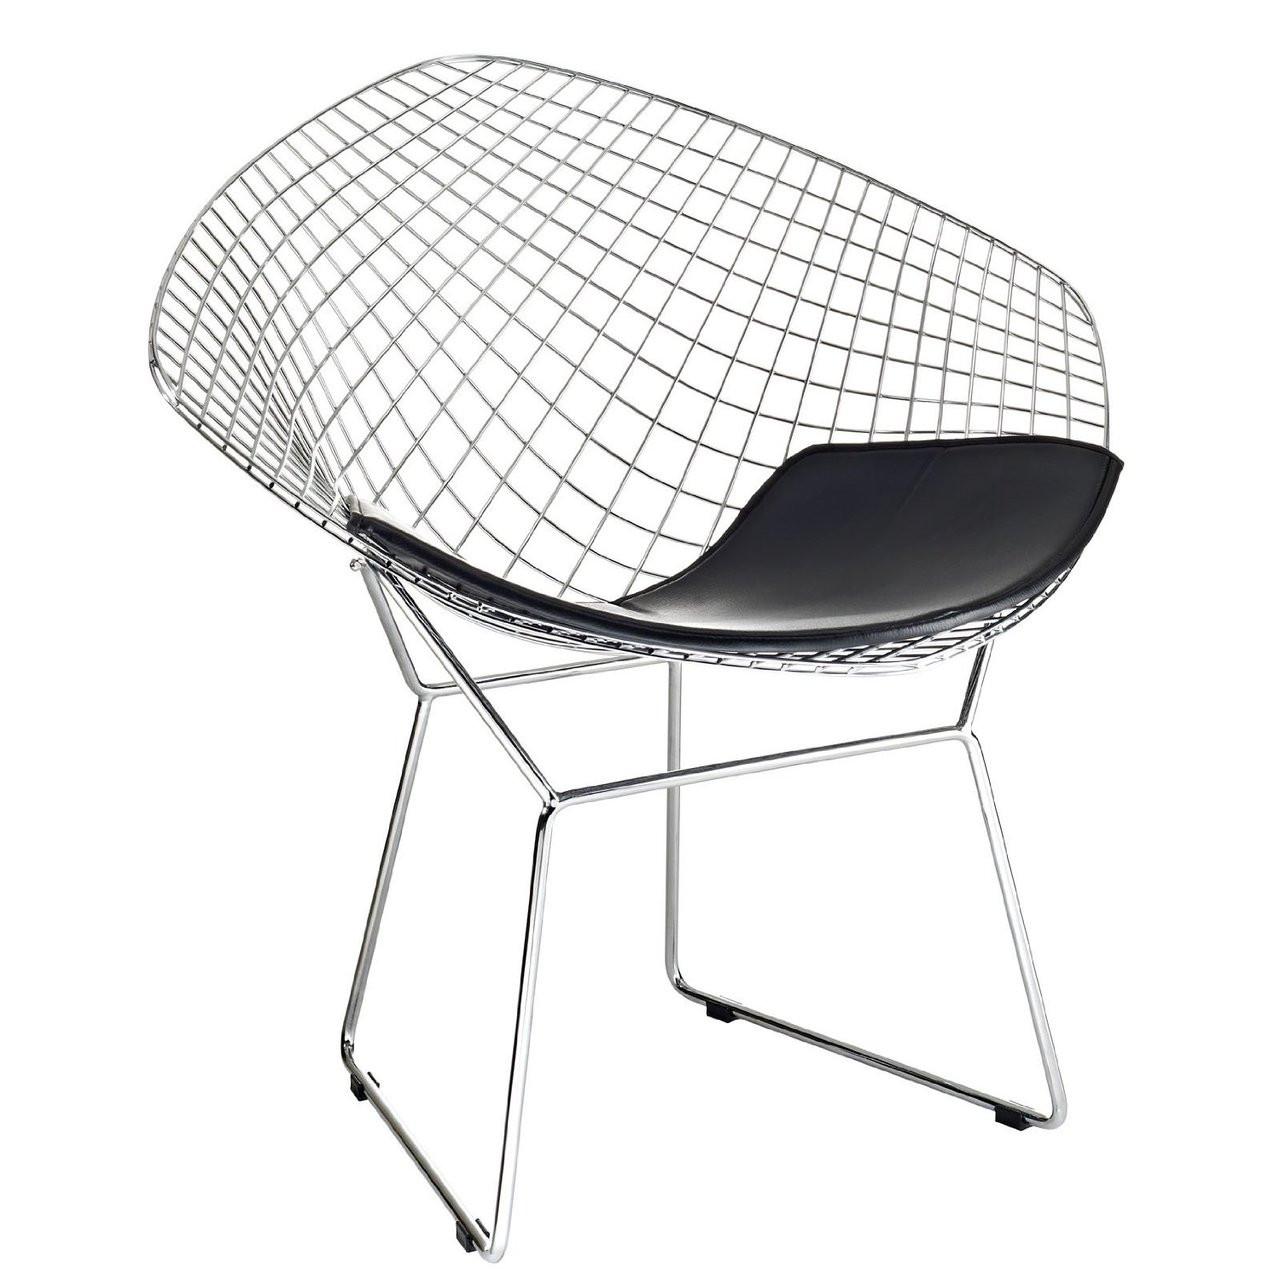 diamond chair replica butterfly stand bertoia wire